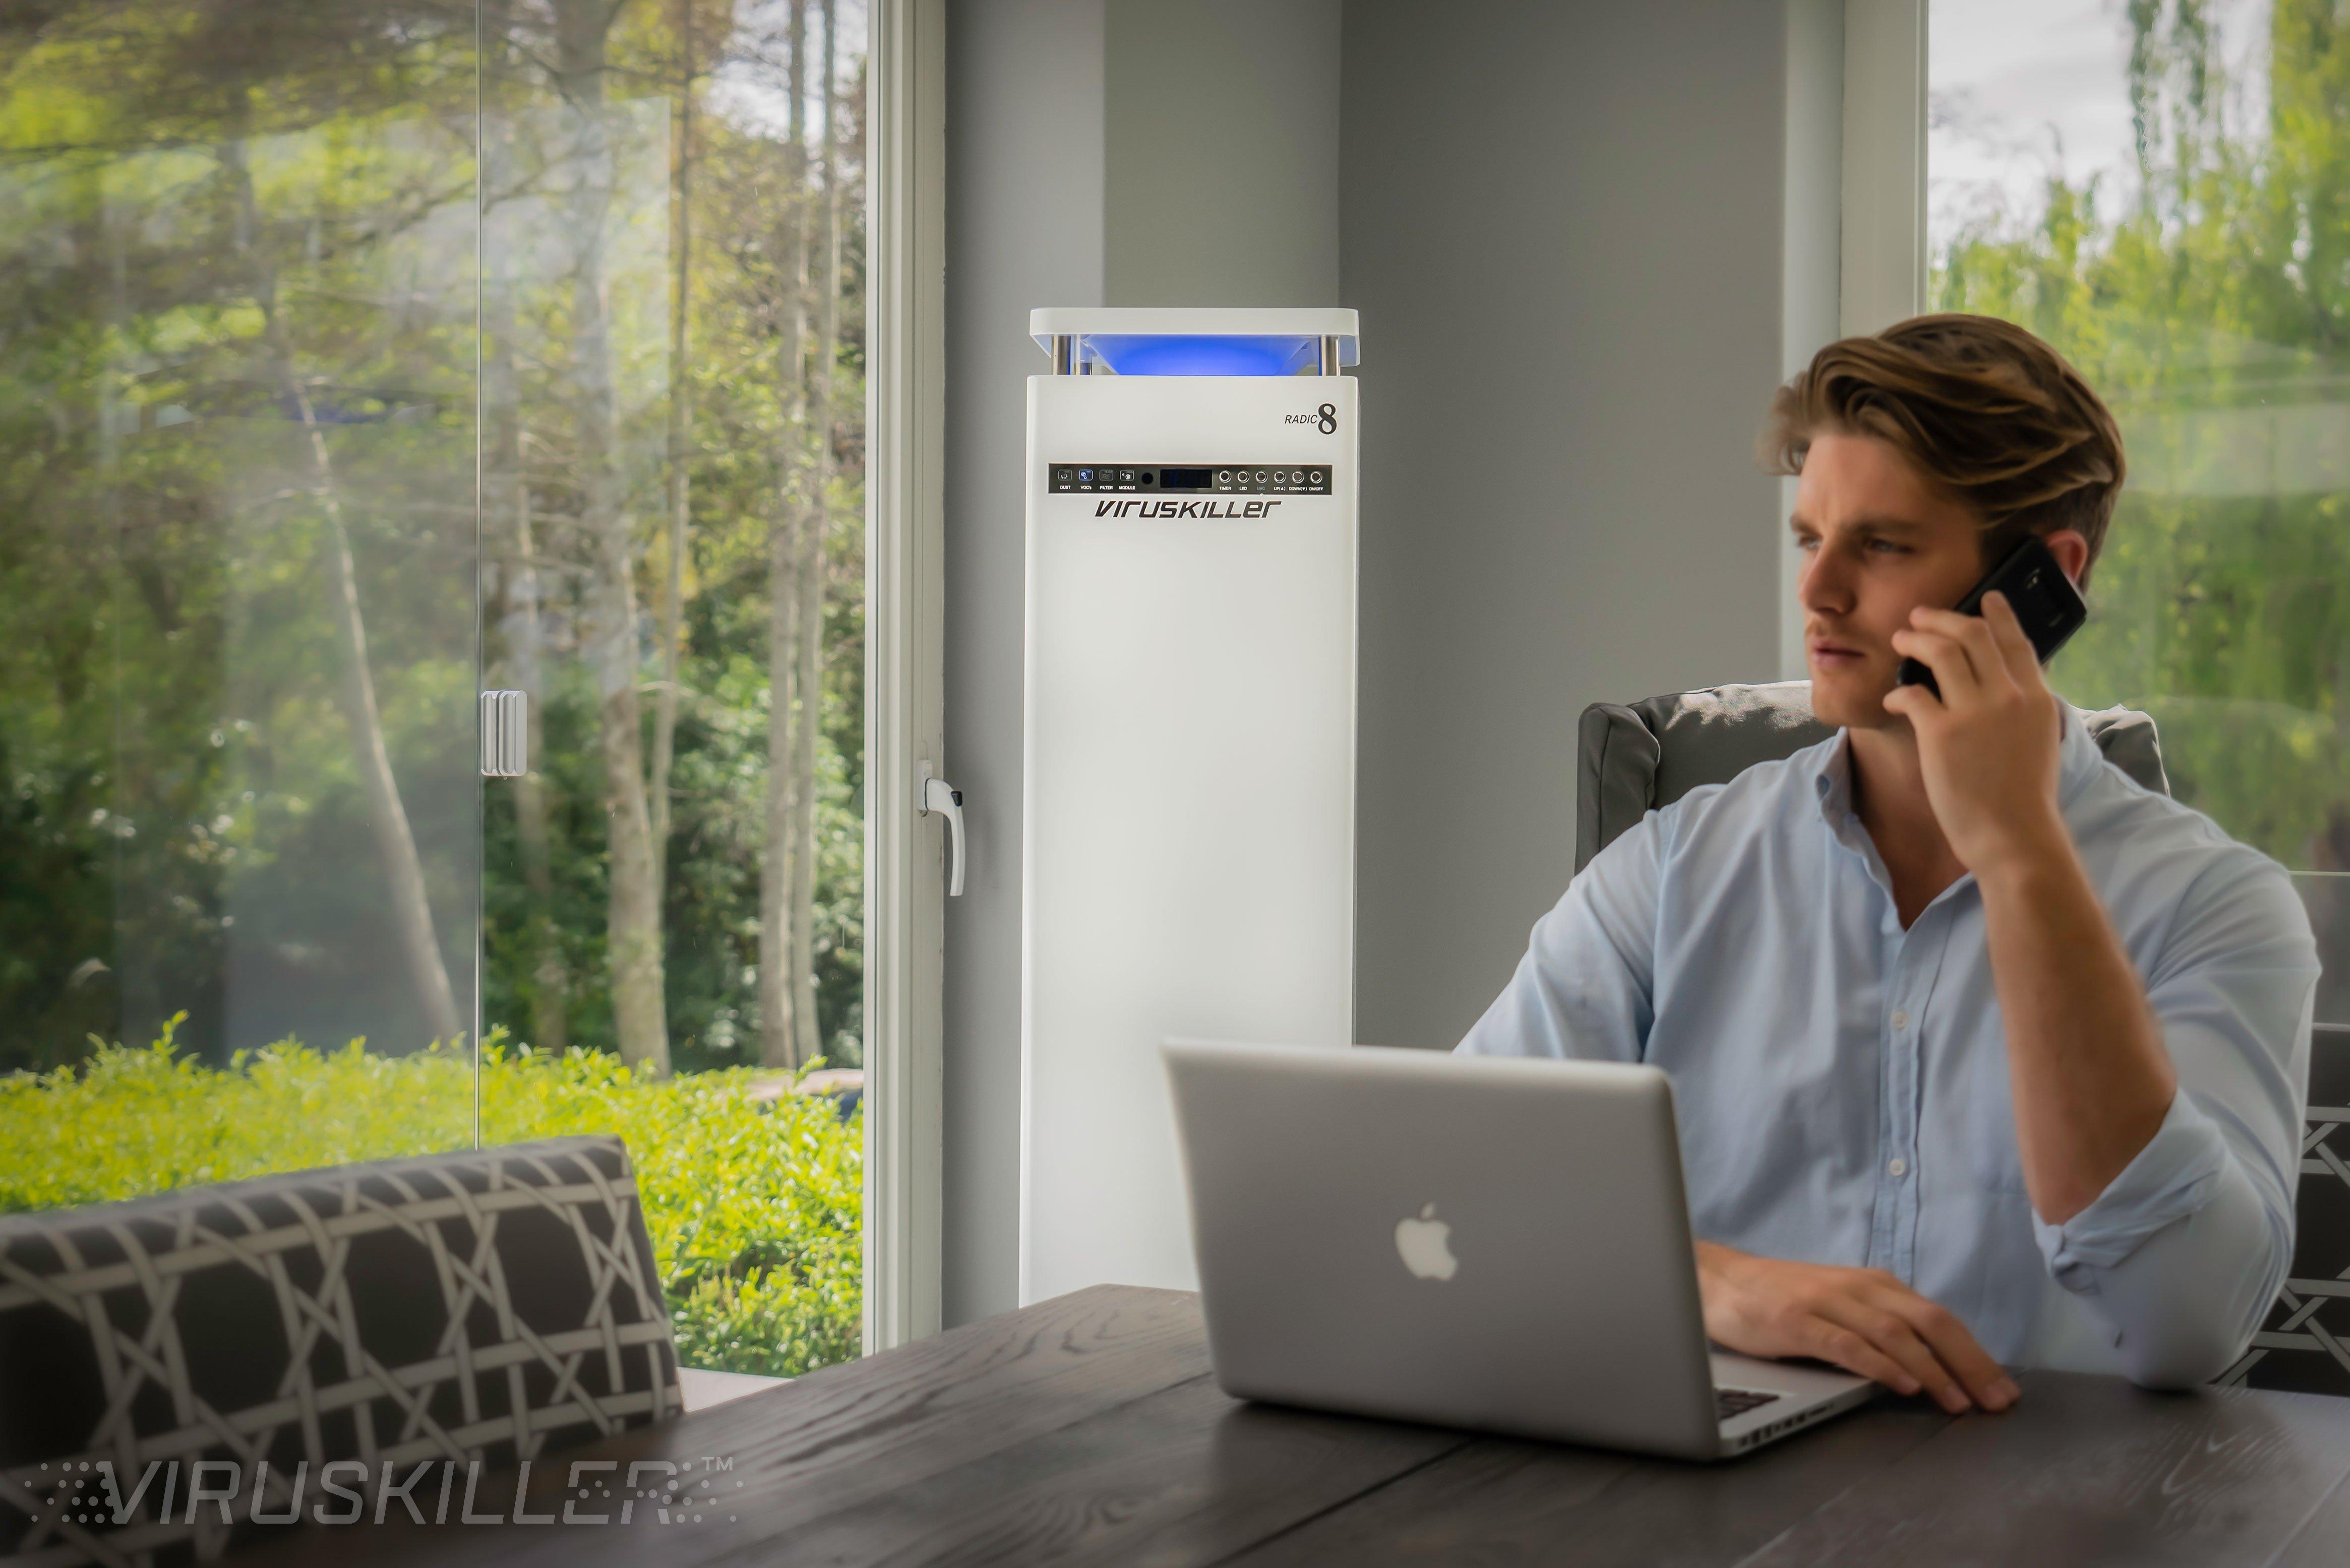 How the VIRUSKILLER decontaminates the air you breathe